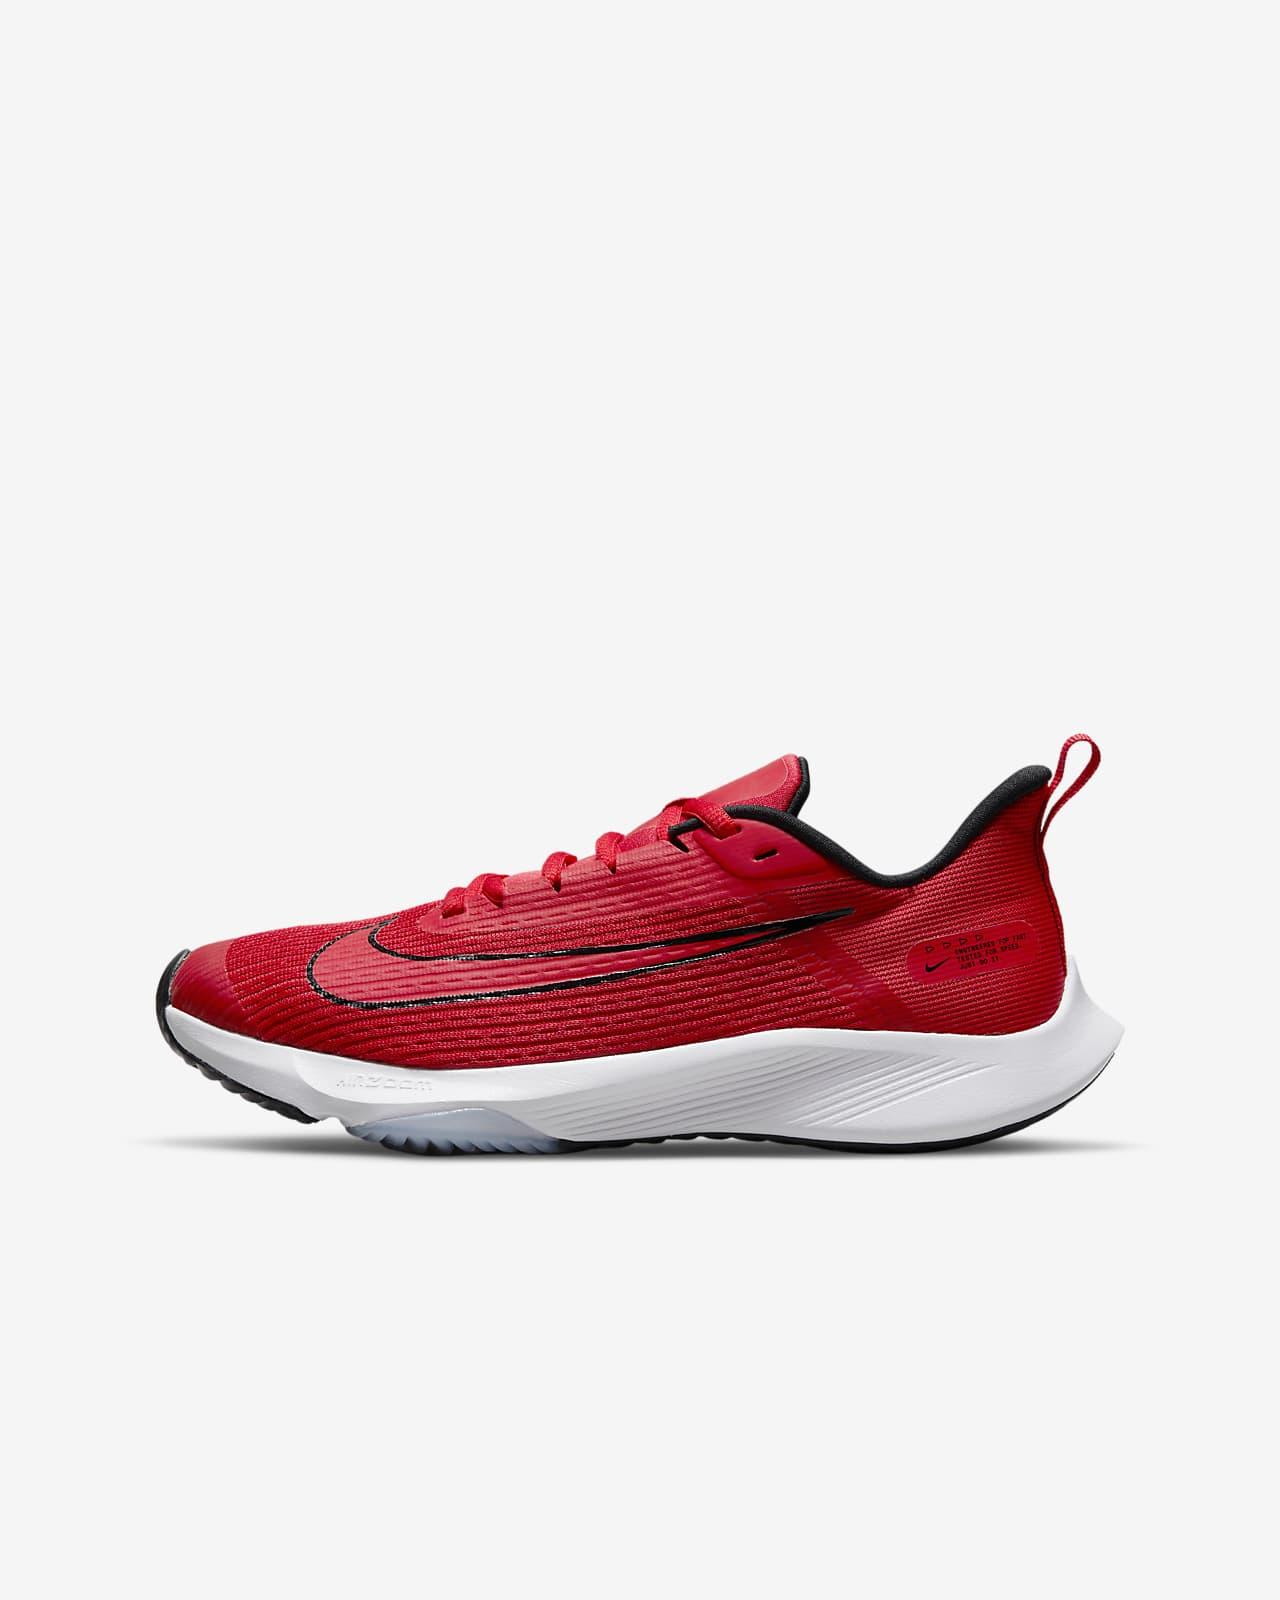 Nike Air Zoom Speed 2 Younger/Older Kids' Running Shoe